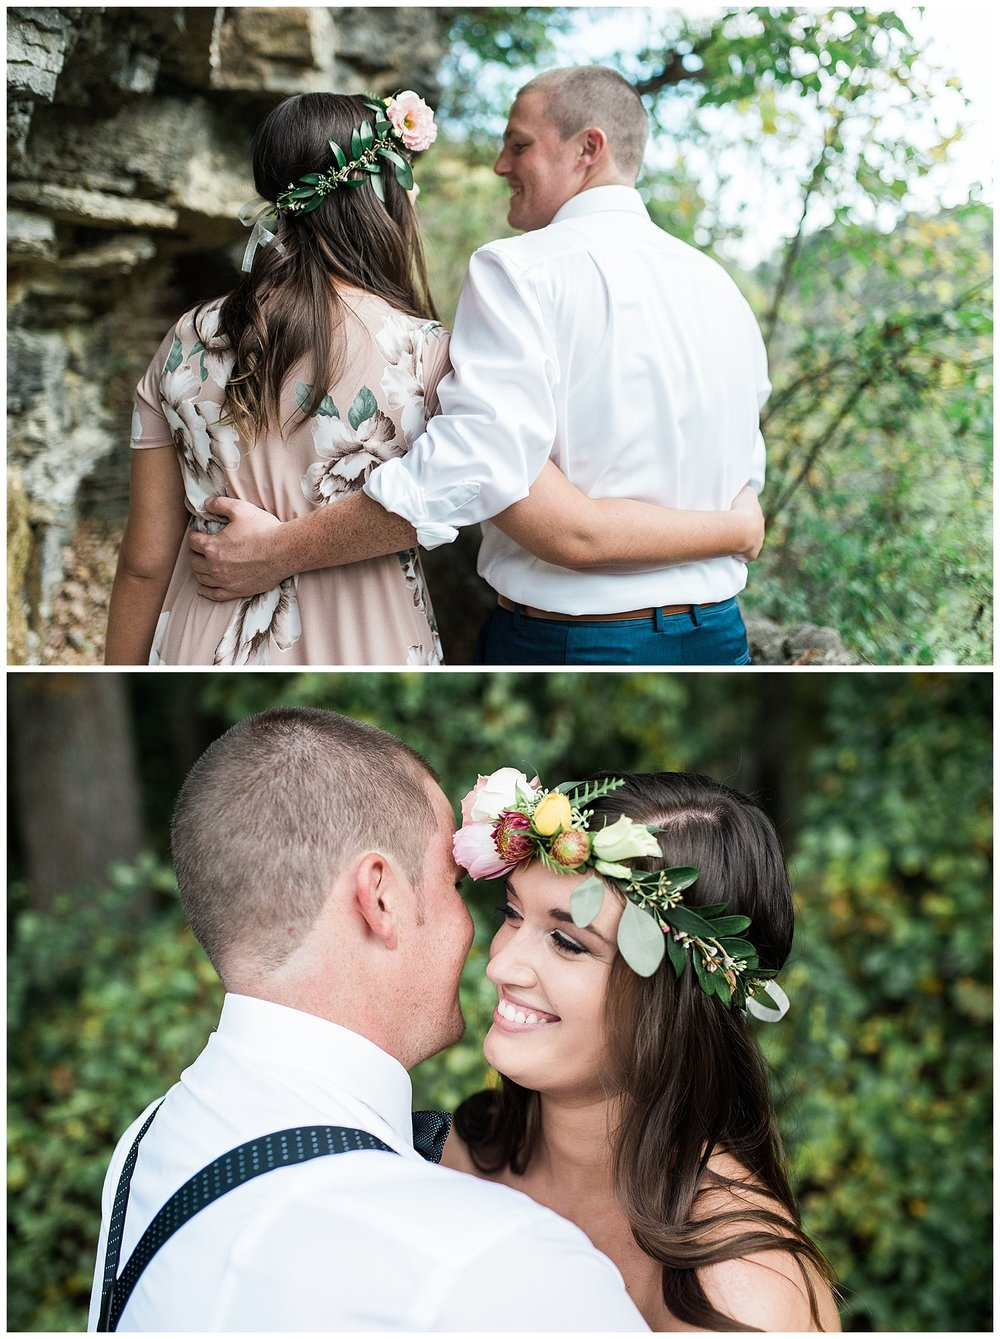 everleigh-photography-cincinnati-wedding-photographer-best-moments-of-2016-cincinnati-wedding-cincinnati-weddings-04